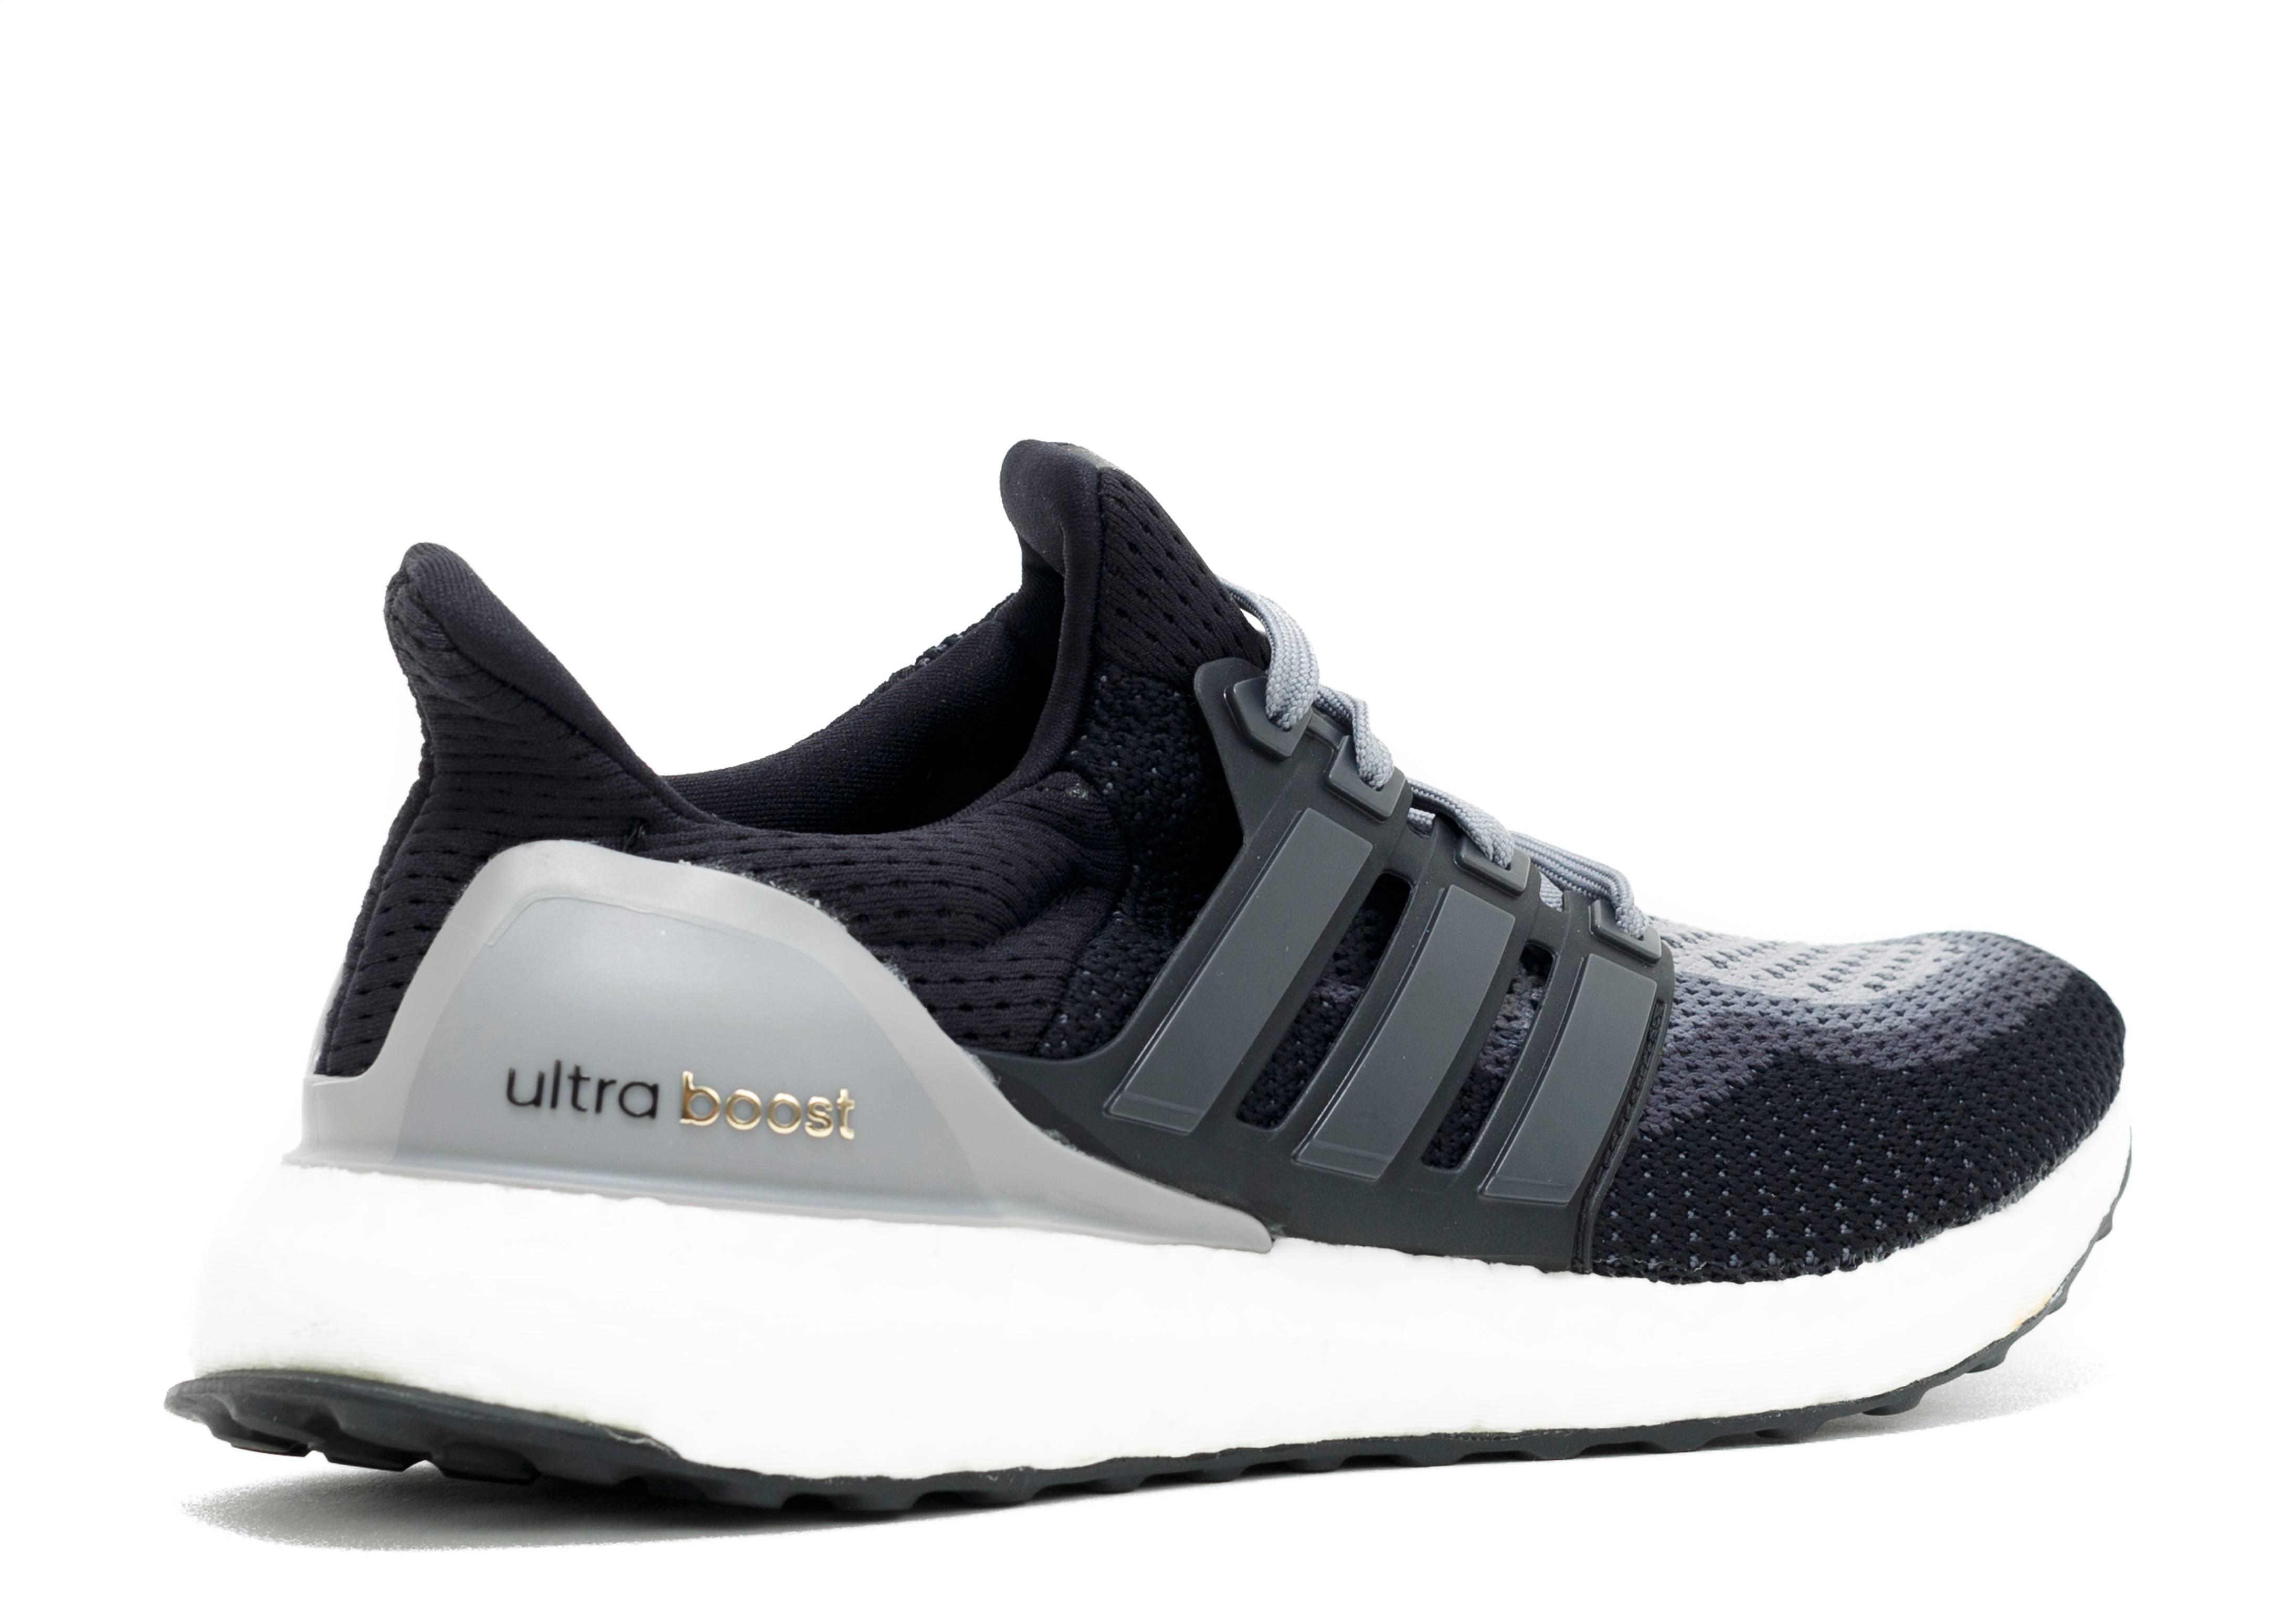 new concept 005d2 6a1fe Ultra Boost W - Adidas - af5141 - core black  black grey   Flight Club